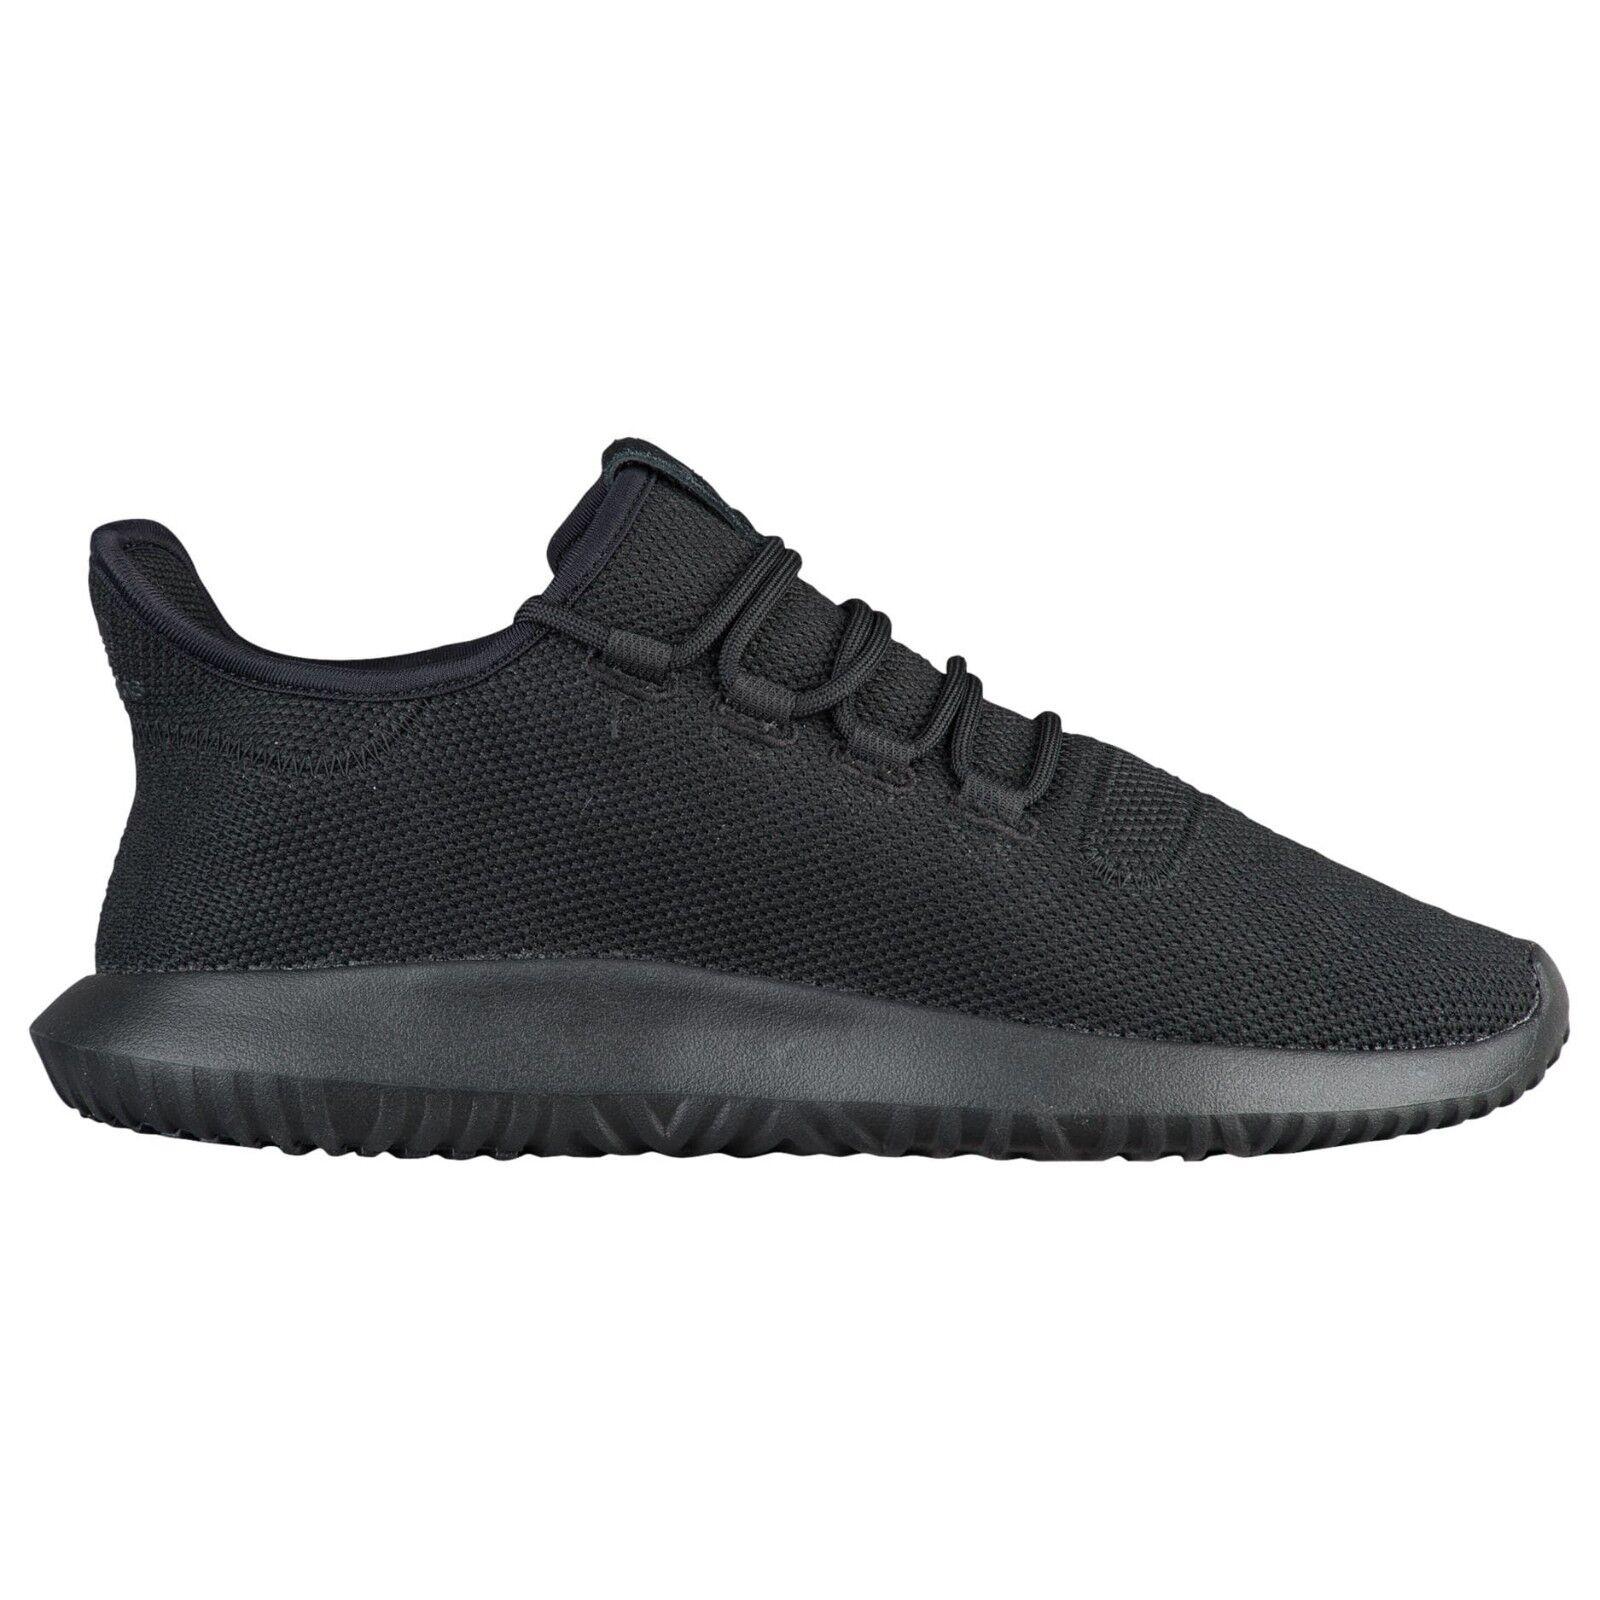 Adidas Originals Tubular Shadow Sneakers In Black CG4562 Sz 6-13